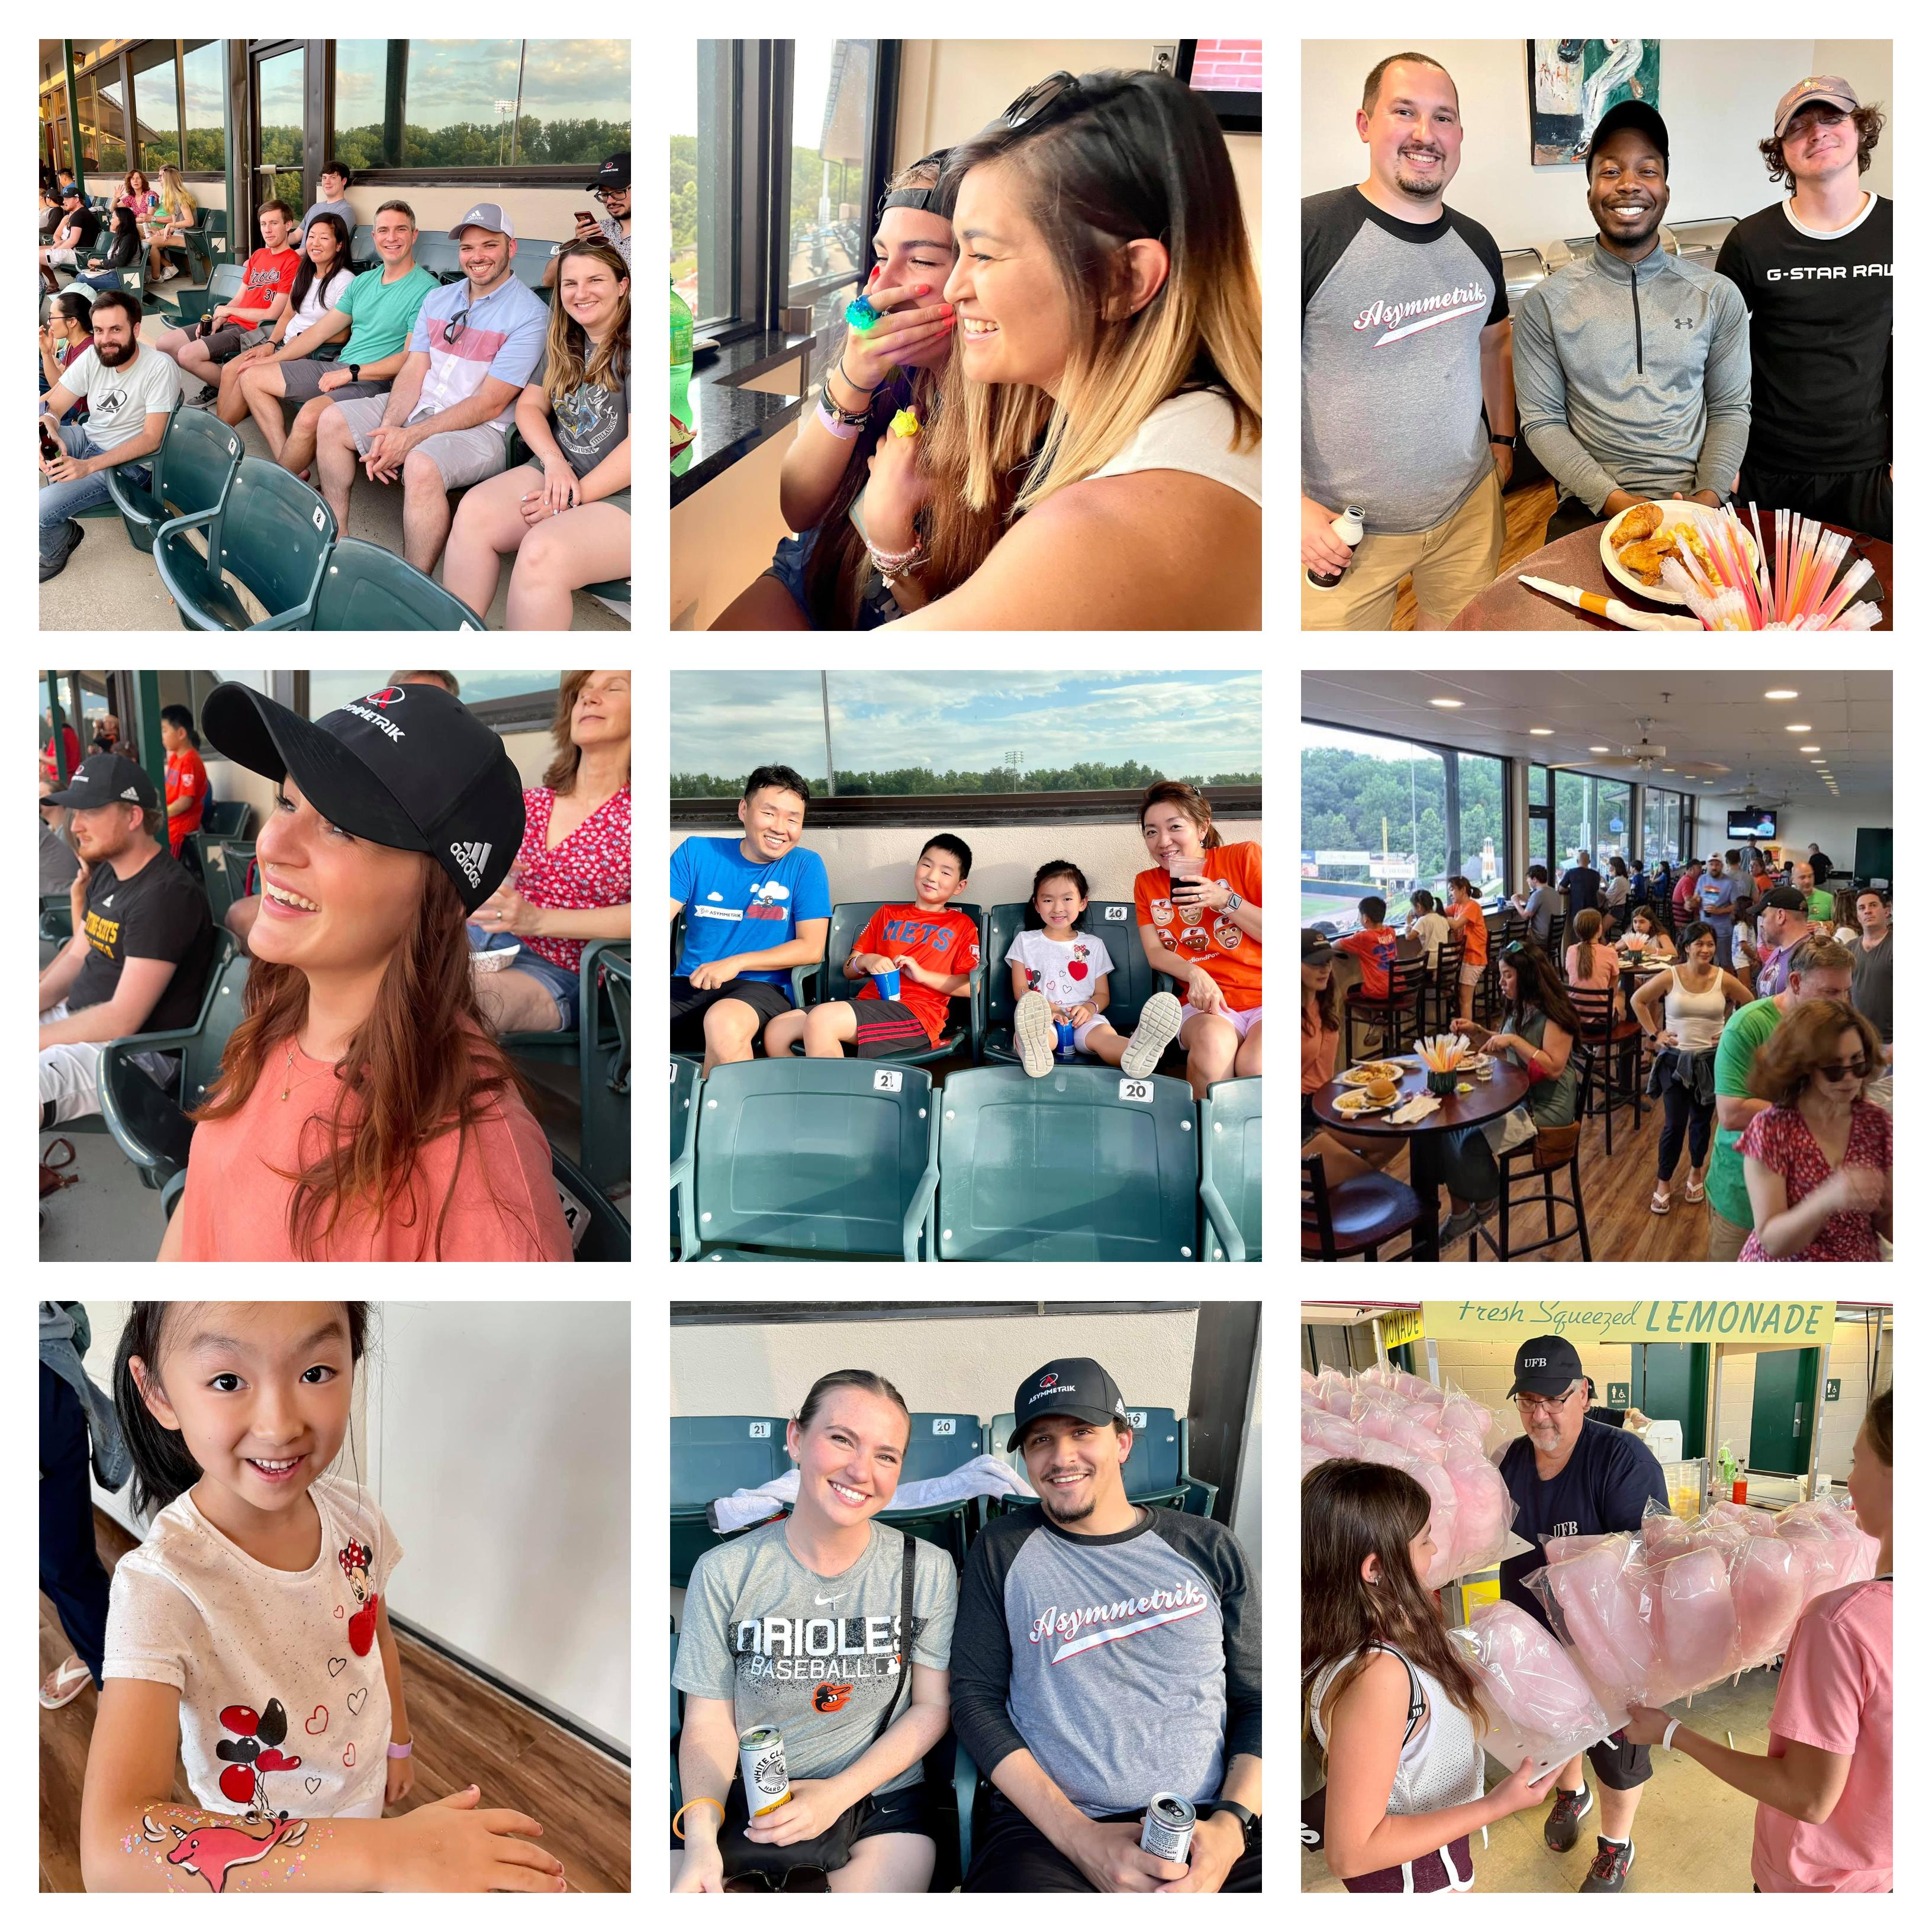 a collage of Asymmetrik employees enjoying themselves at Bowie Baysox